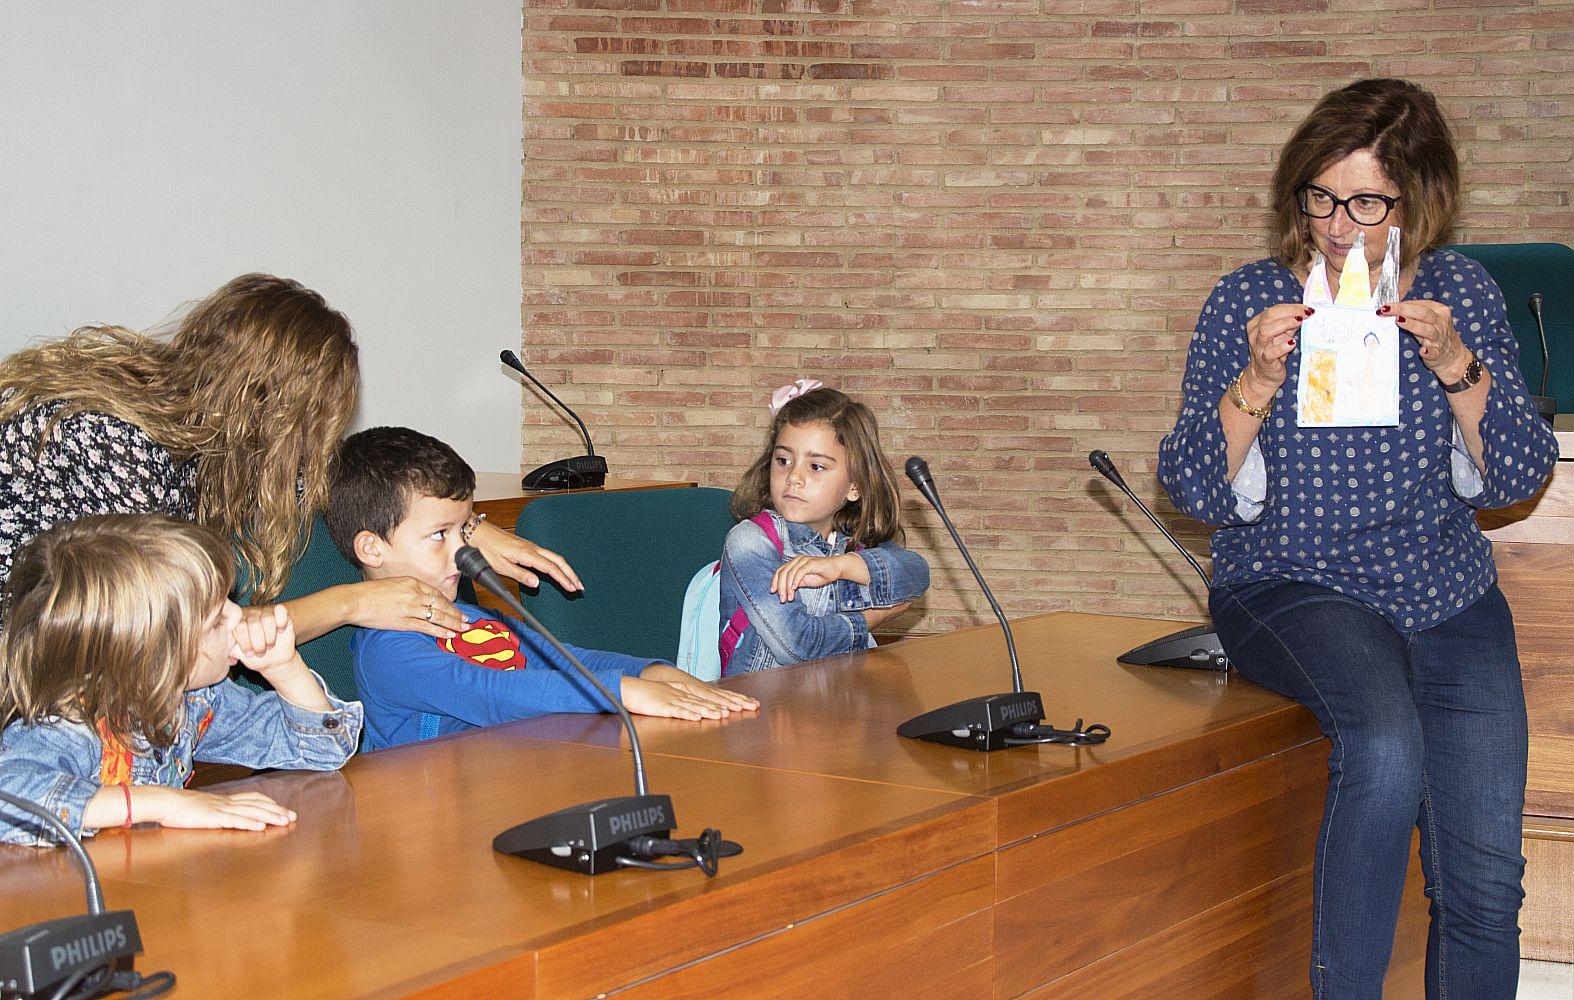 Ajuntament d 39 alaqu s prensa alumnado del colegio - Trabajo en alaquas ...